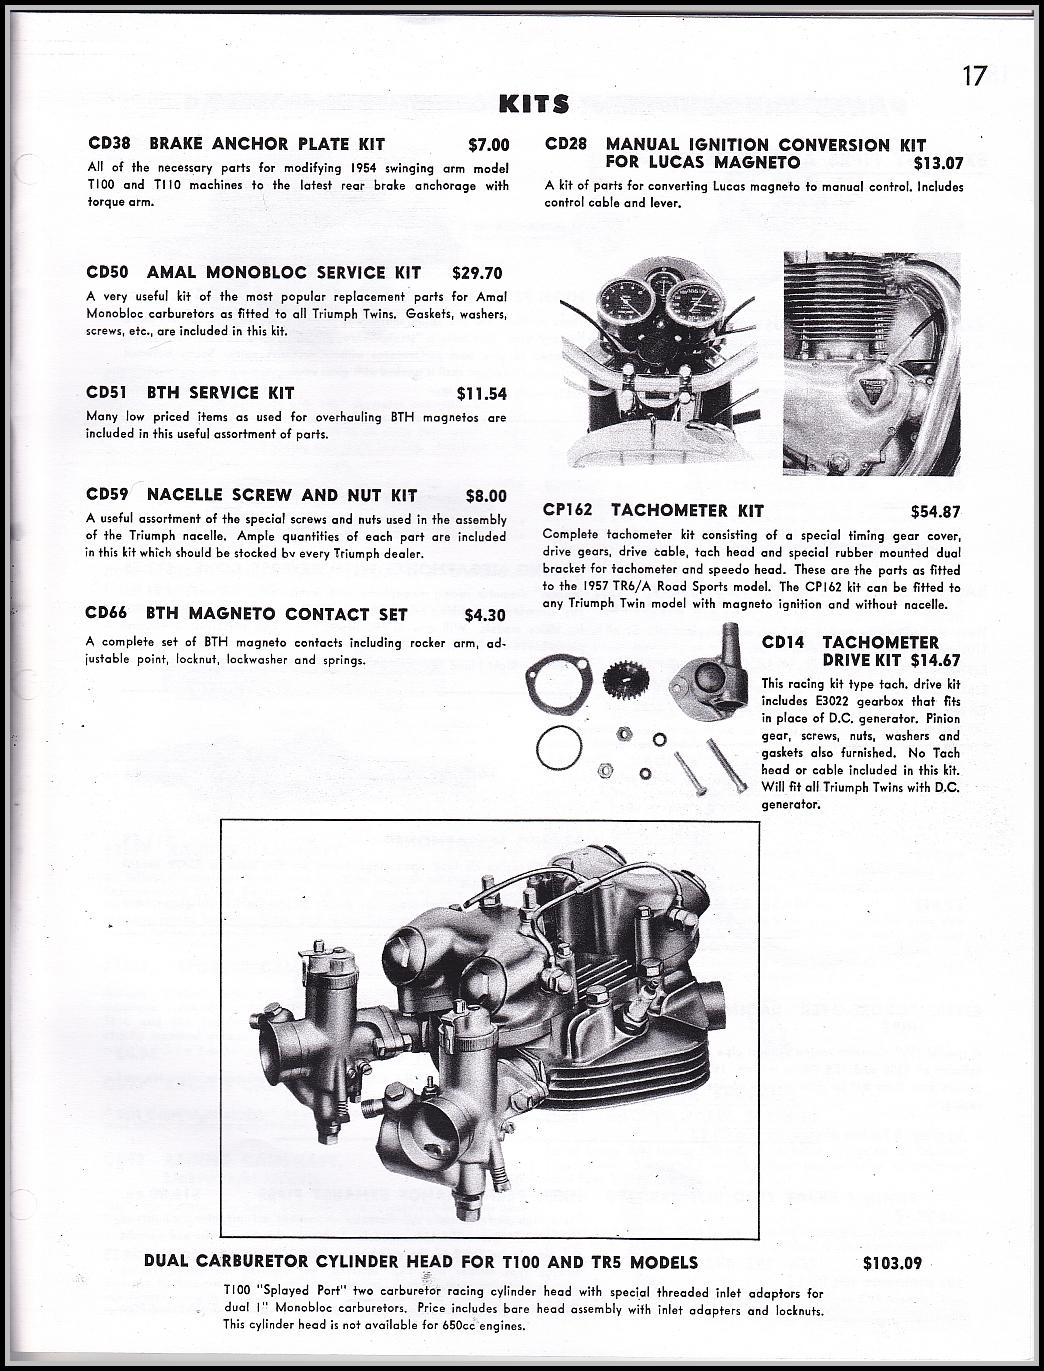 GeekBobber: 1957 TriCor Catalog